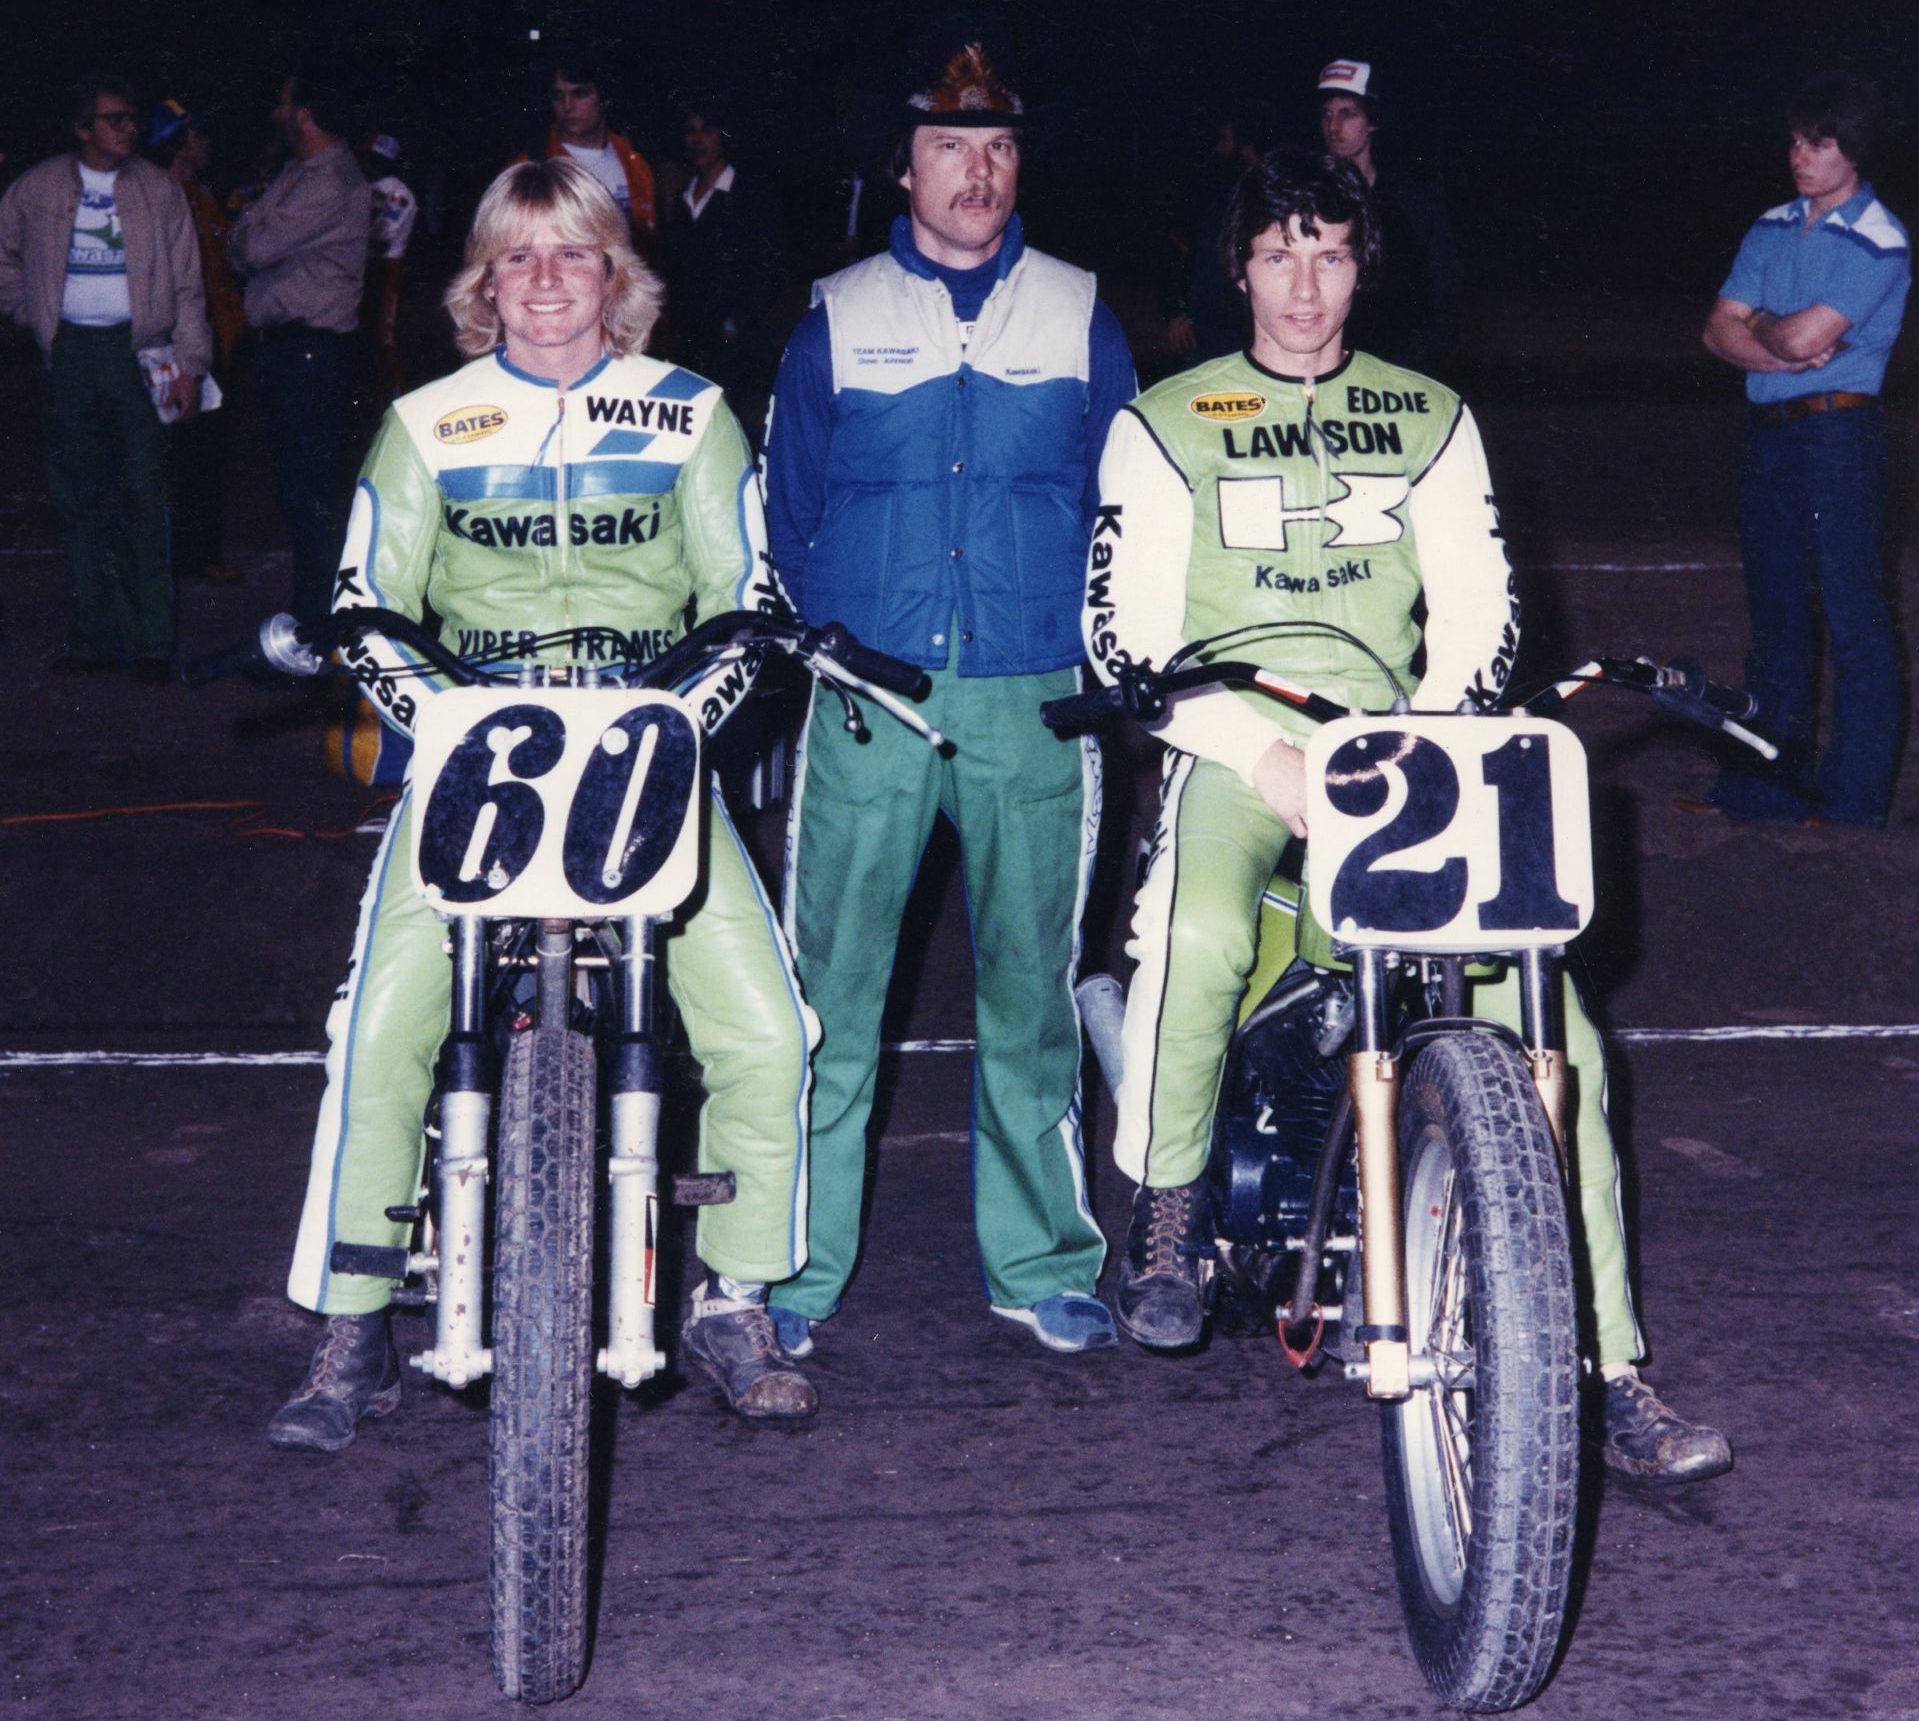 Steve Johnson (center) with Wayne Rainey (left) and Eddie Lawson (right). Photo courtesy Trailblazers.